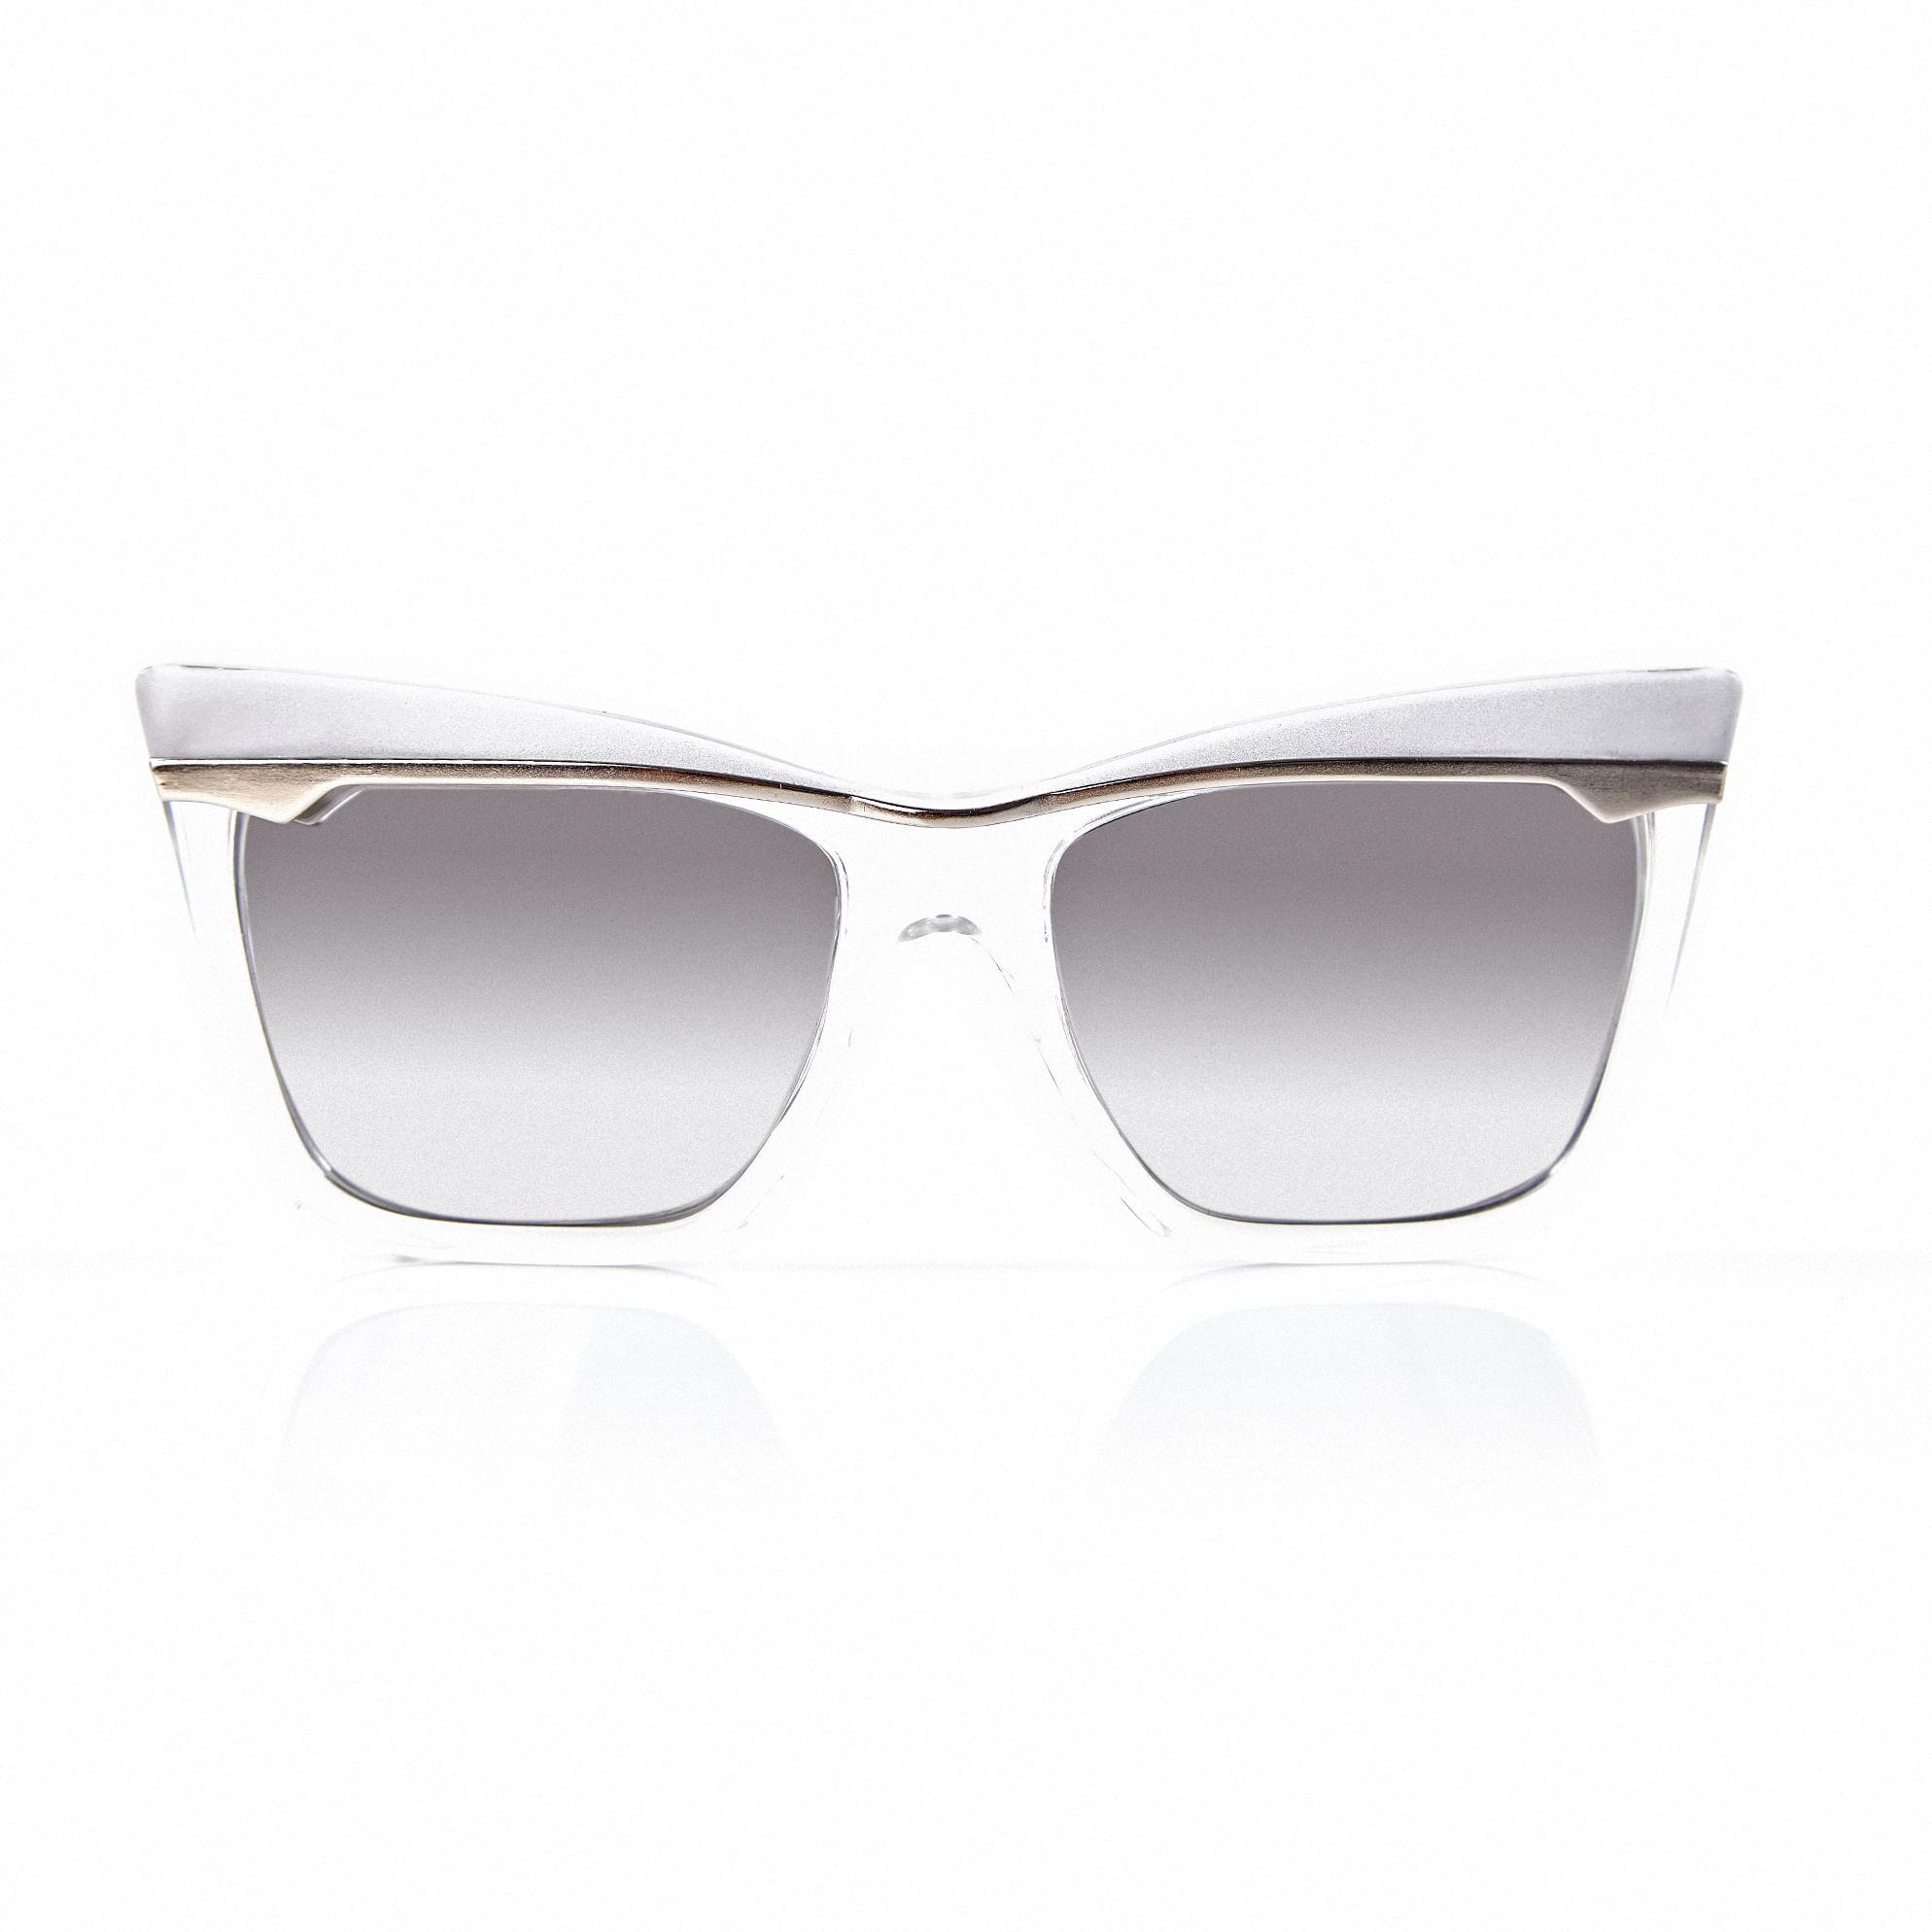 780be871a4d54 morenarosa · Acessórios · Óculos · Oculos Max Gatinho Branco - TU